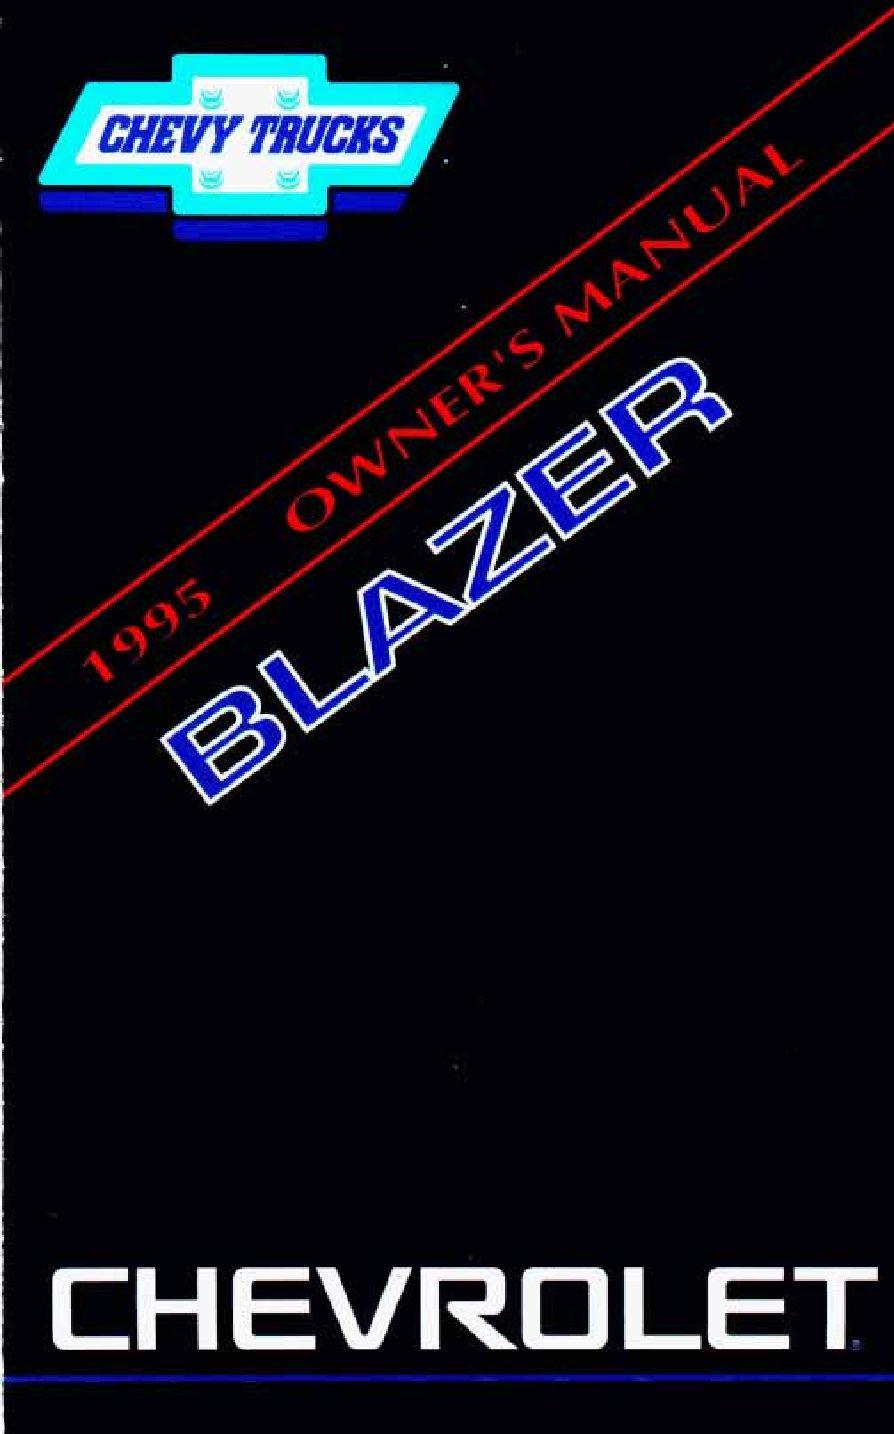 1995 chevrolet blazer owners manual just give me the damn manual rh justgivemethedamnmanual com 1995 chevrolet blazer service manual 1995 chevrolet blazer service manual